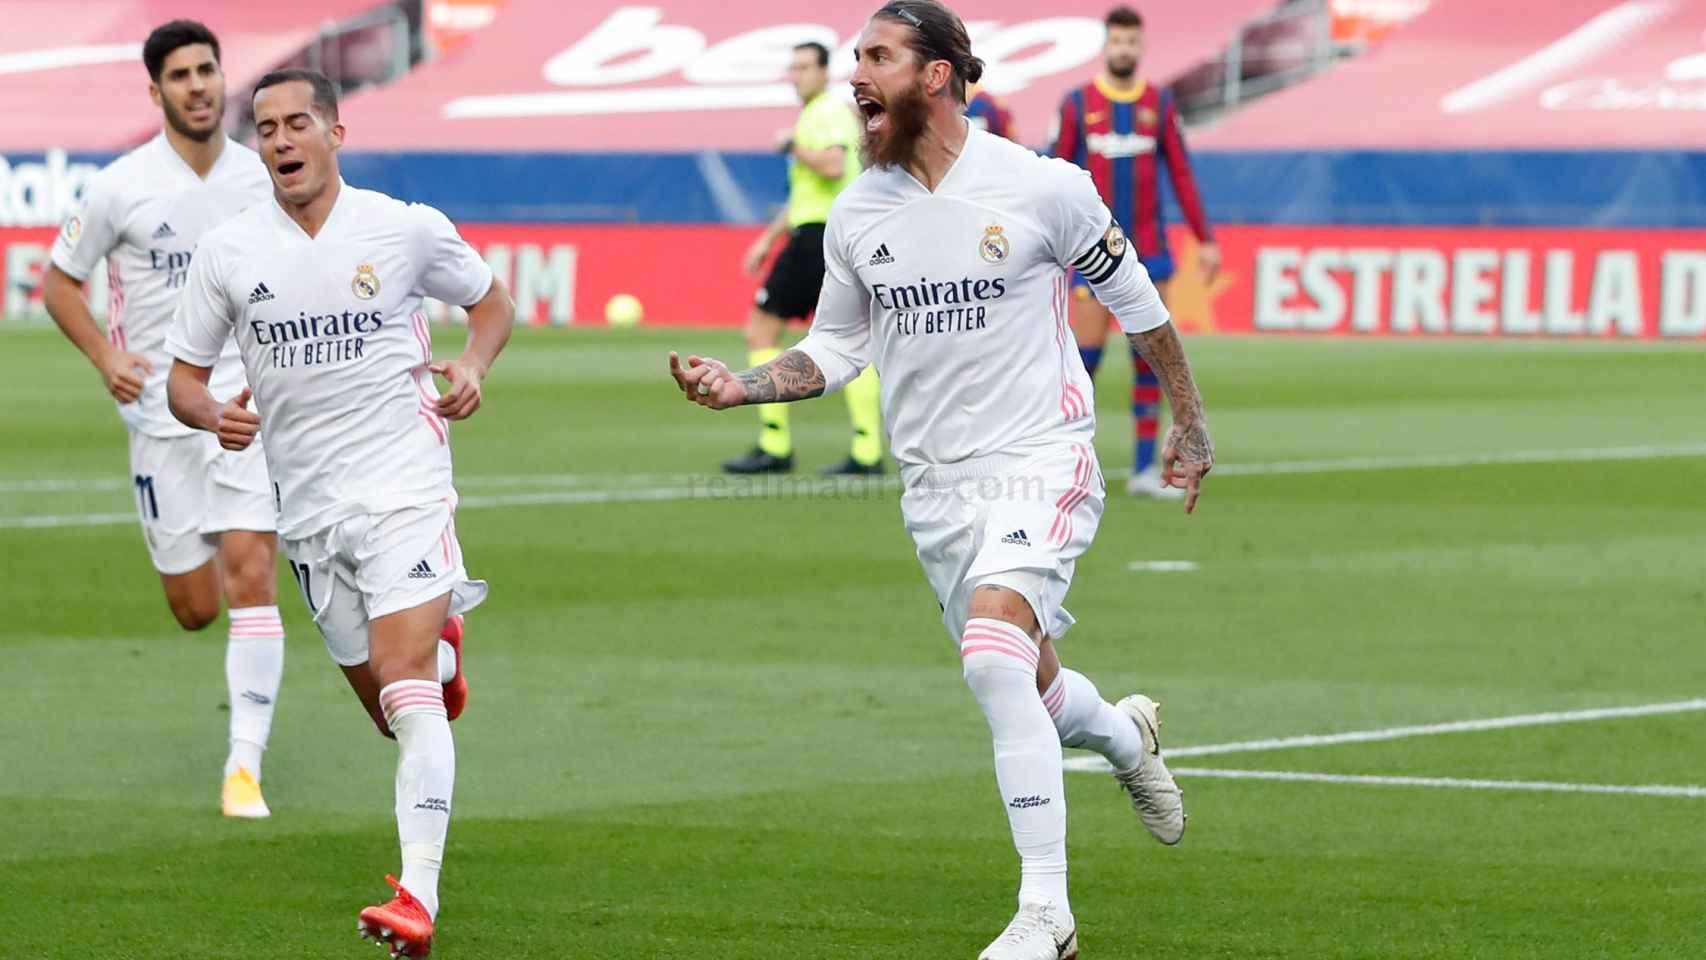 Lucas Vázquez celebra el gol de Ramos